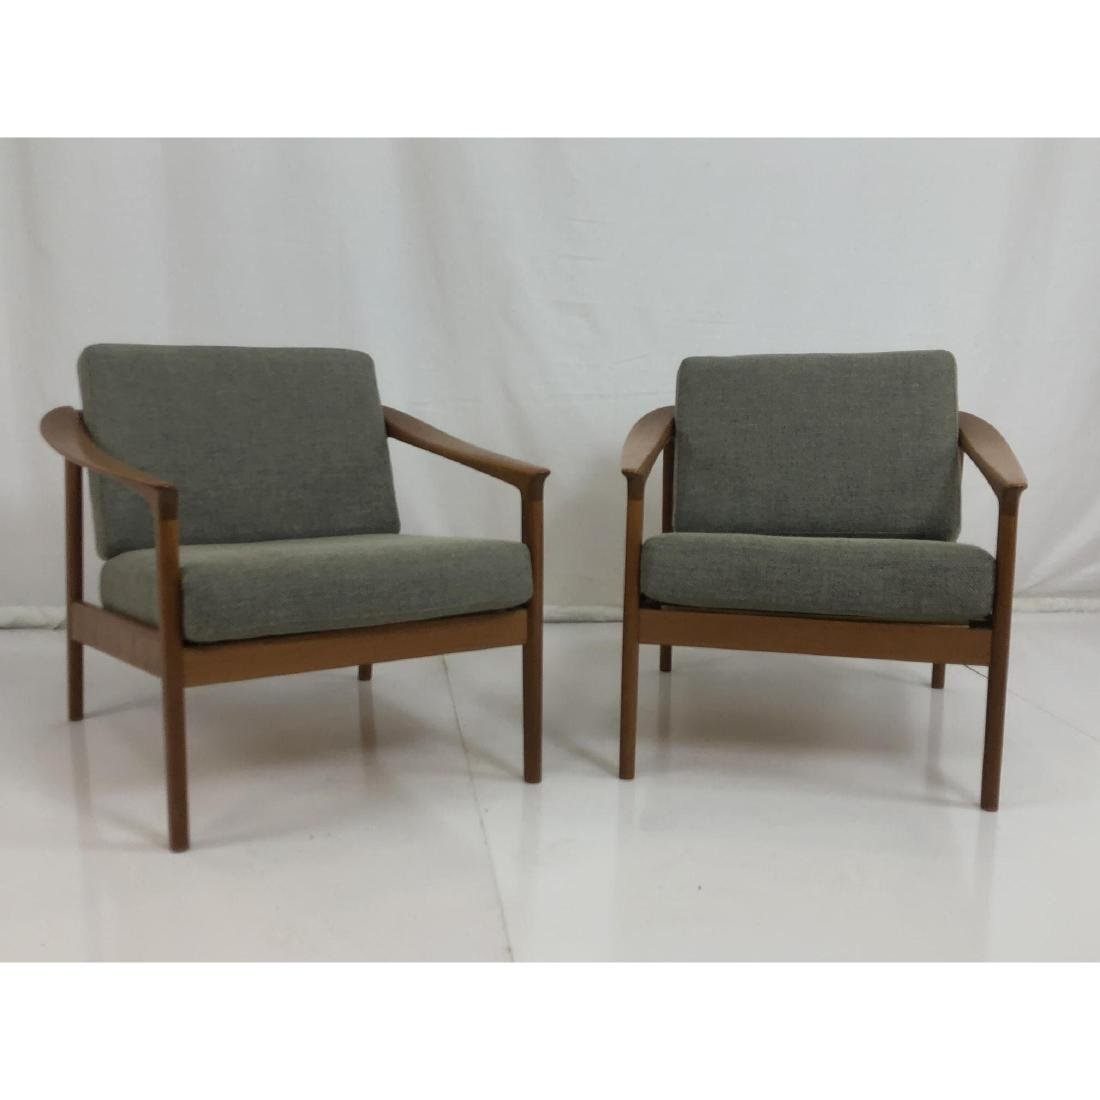 Pr FOLKE OHLSSON Danish Modern Teak Lounge Chairs - 2